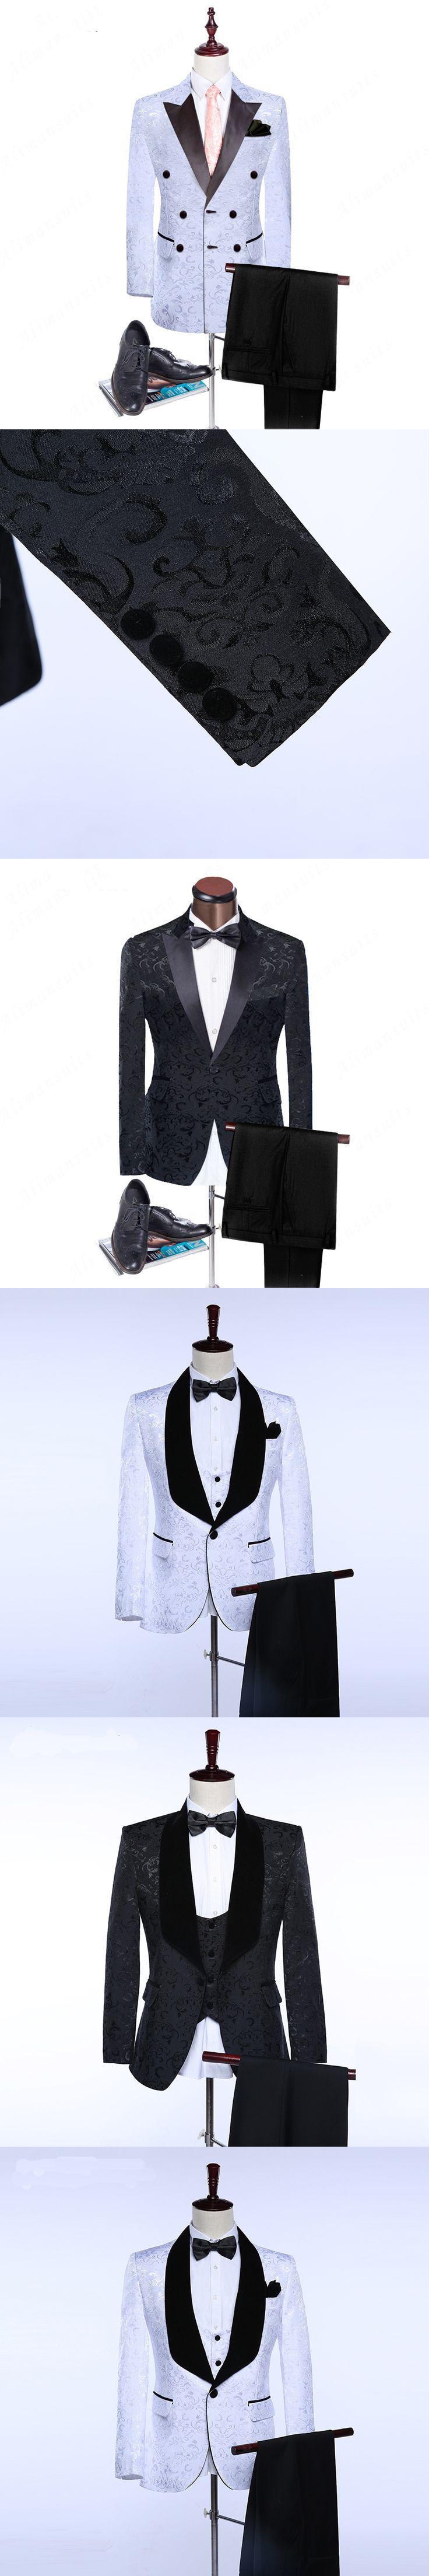 HB001 Brand New Groomsmen Shawl Lapel Groom Tuxedos White Black Men Suits Wedding Best Man Blazer  (Jacket+Pants+Bow Tie+Vest)